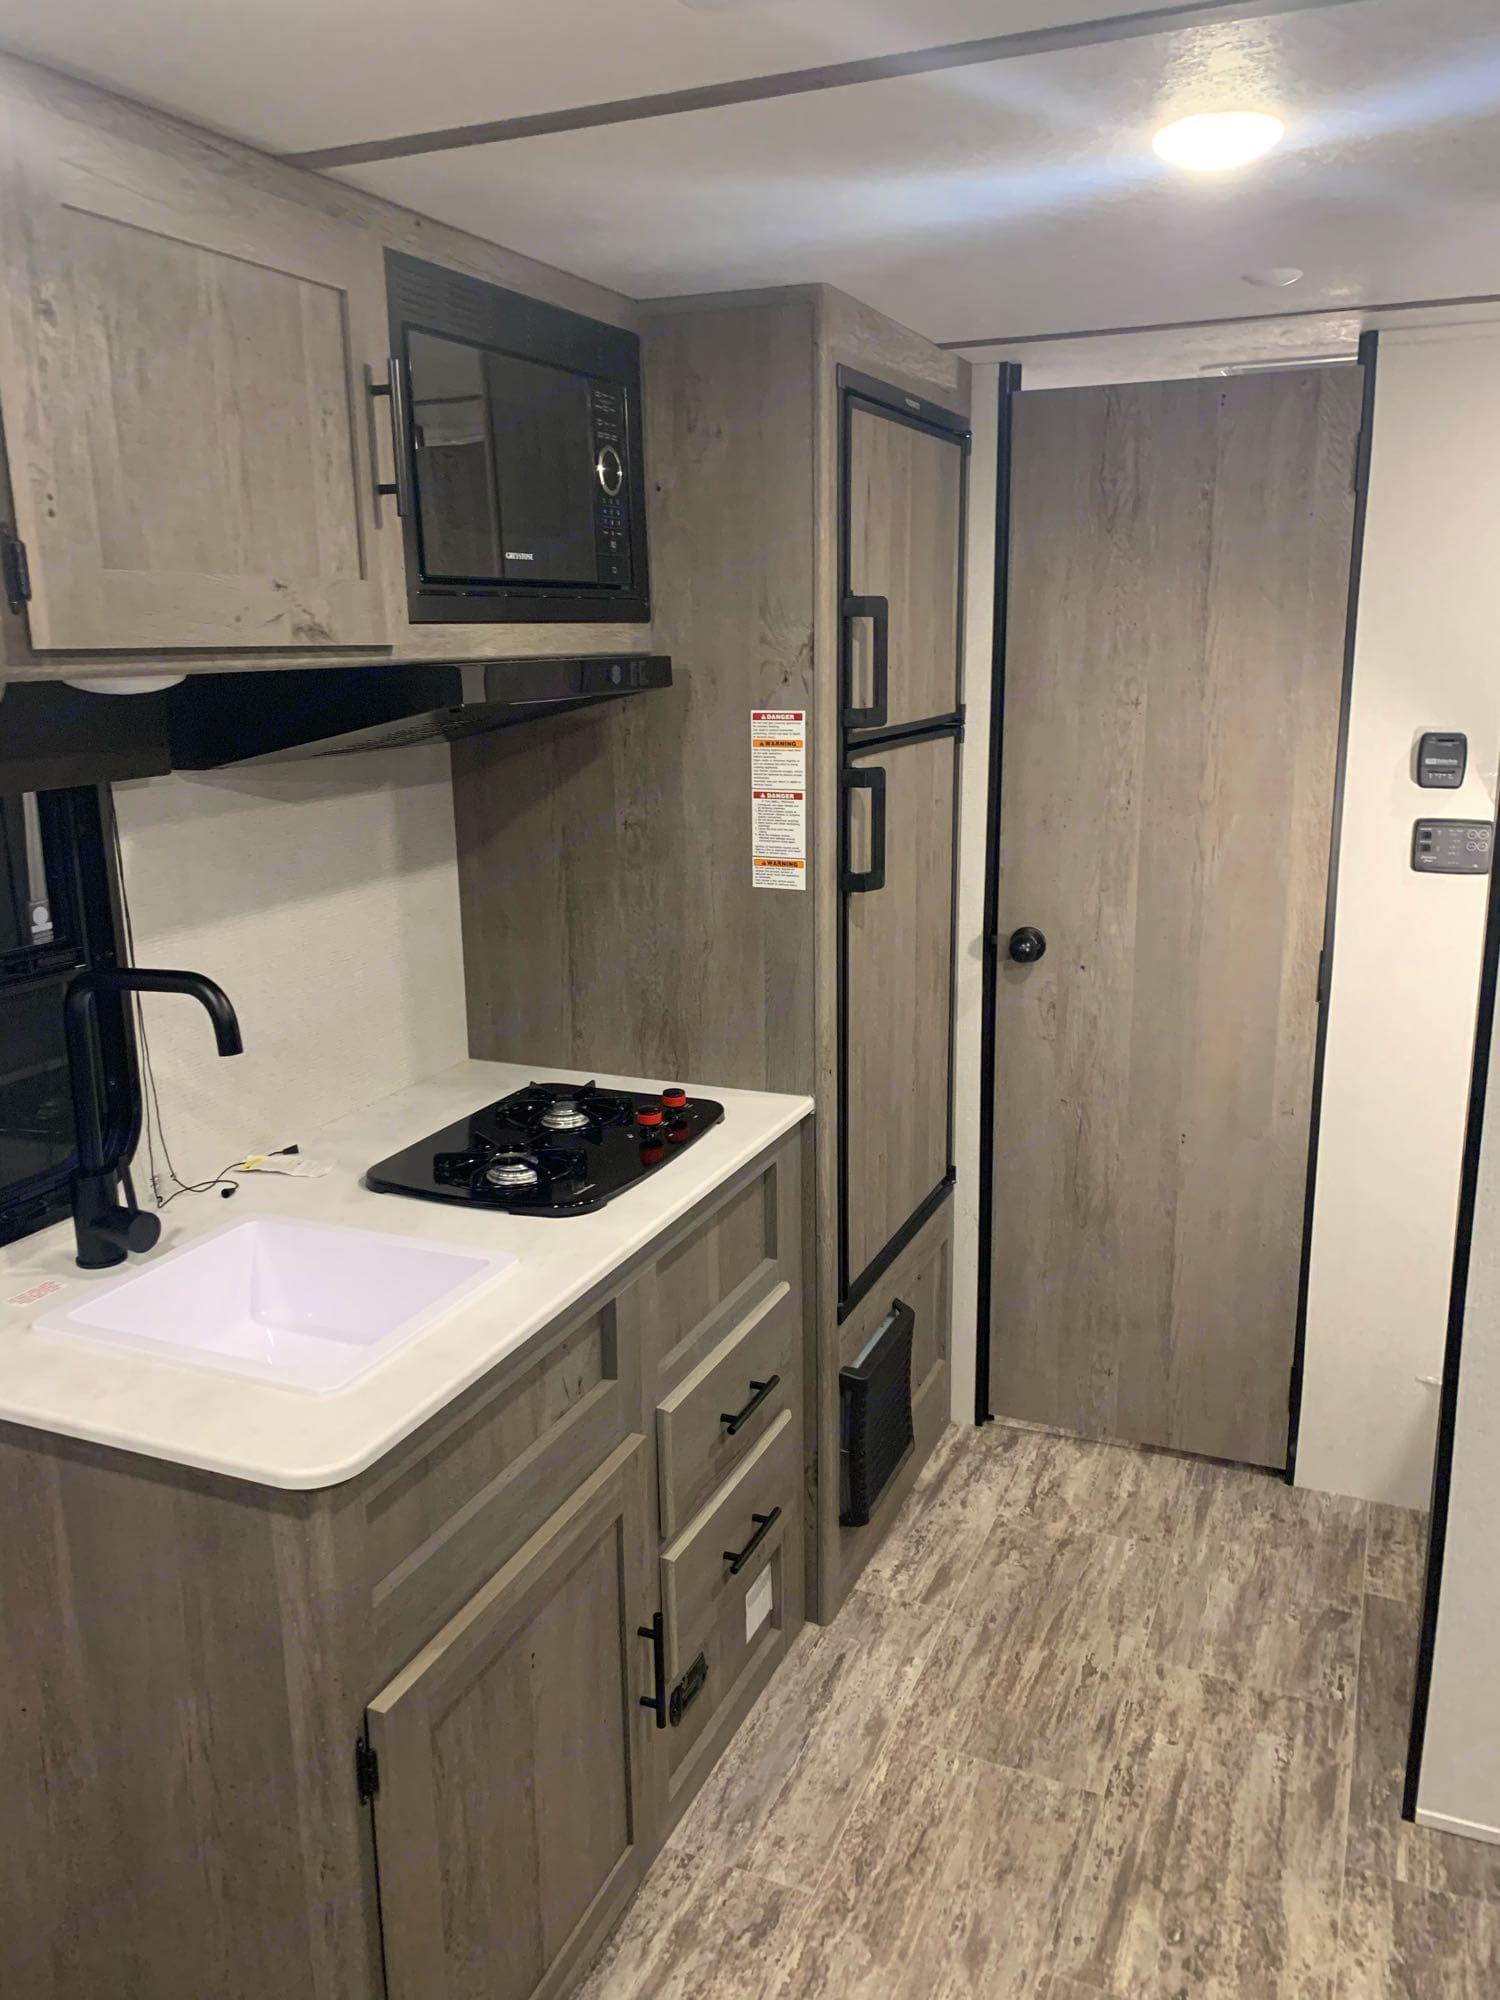 kitchen with stove top, microwave, huge fridge/freezer, and sink. Keystone Springdale 2021